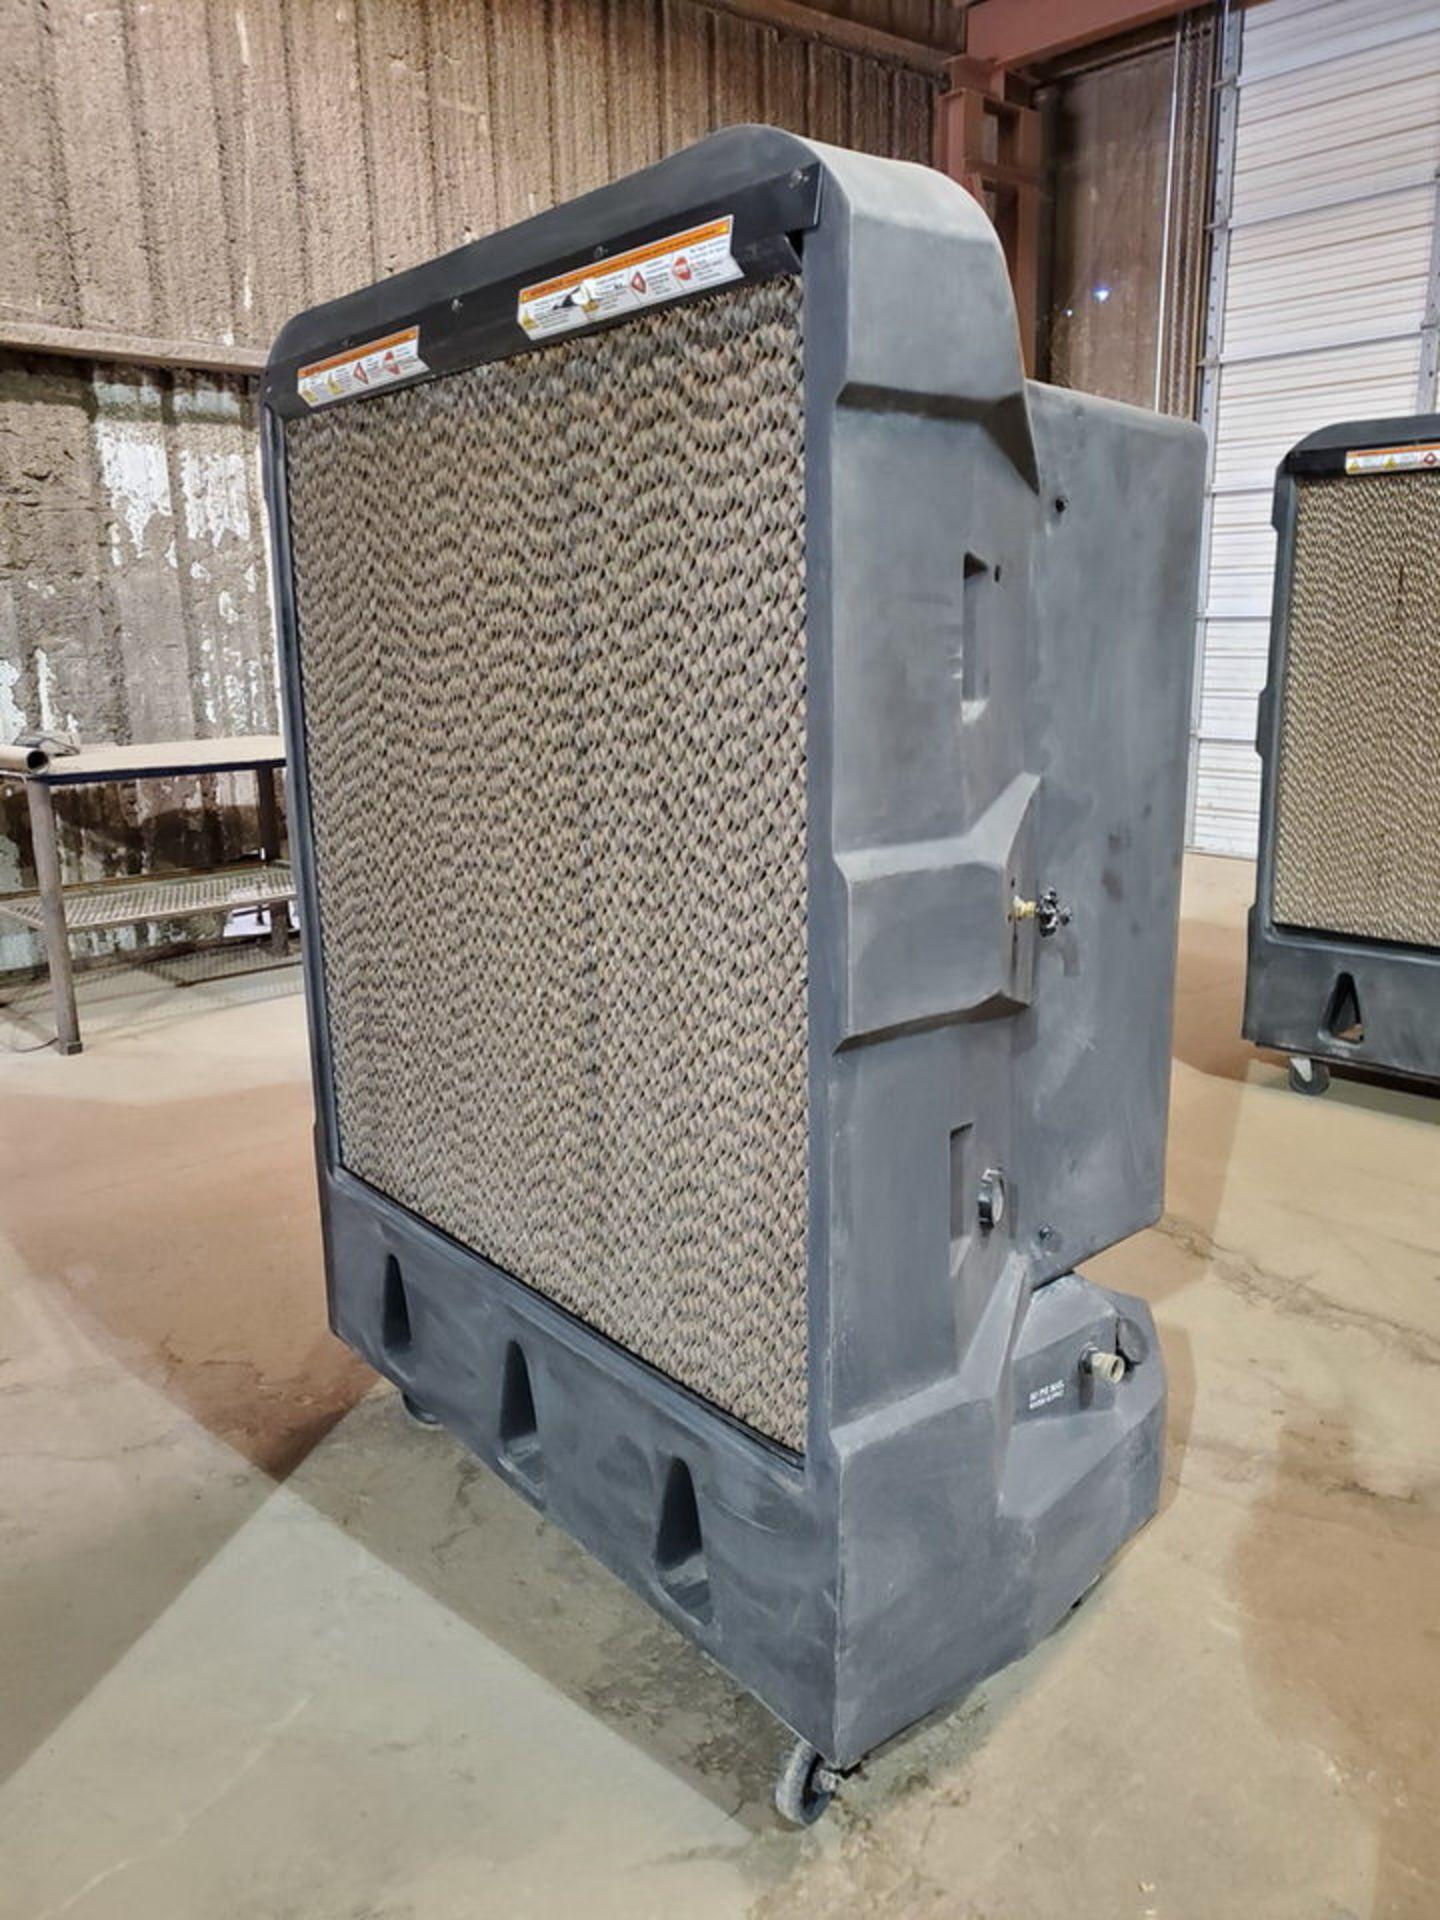 Portacool Cyclone 160 Portable Evaporative Cooler 115V, 60HZ, 7.3A - Image 2 of 7